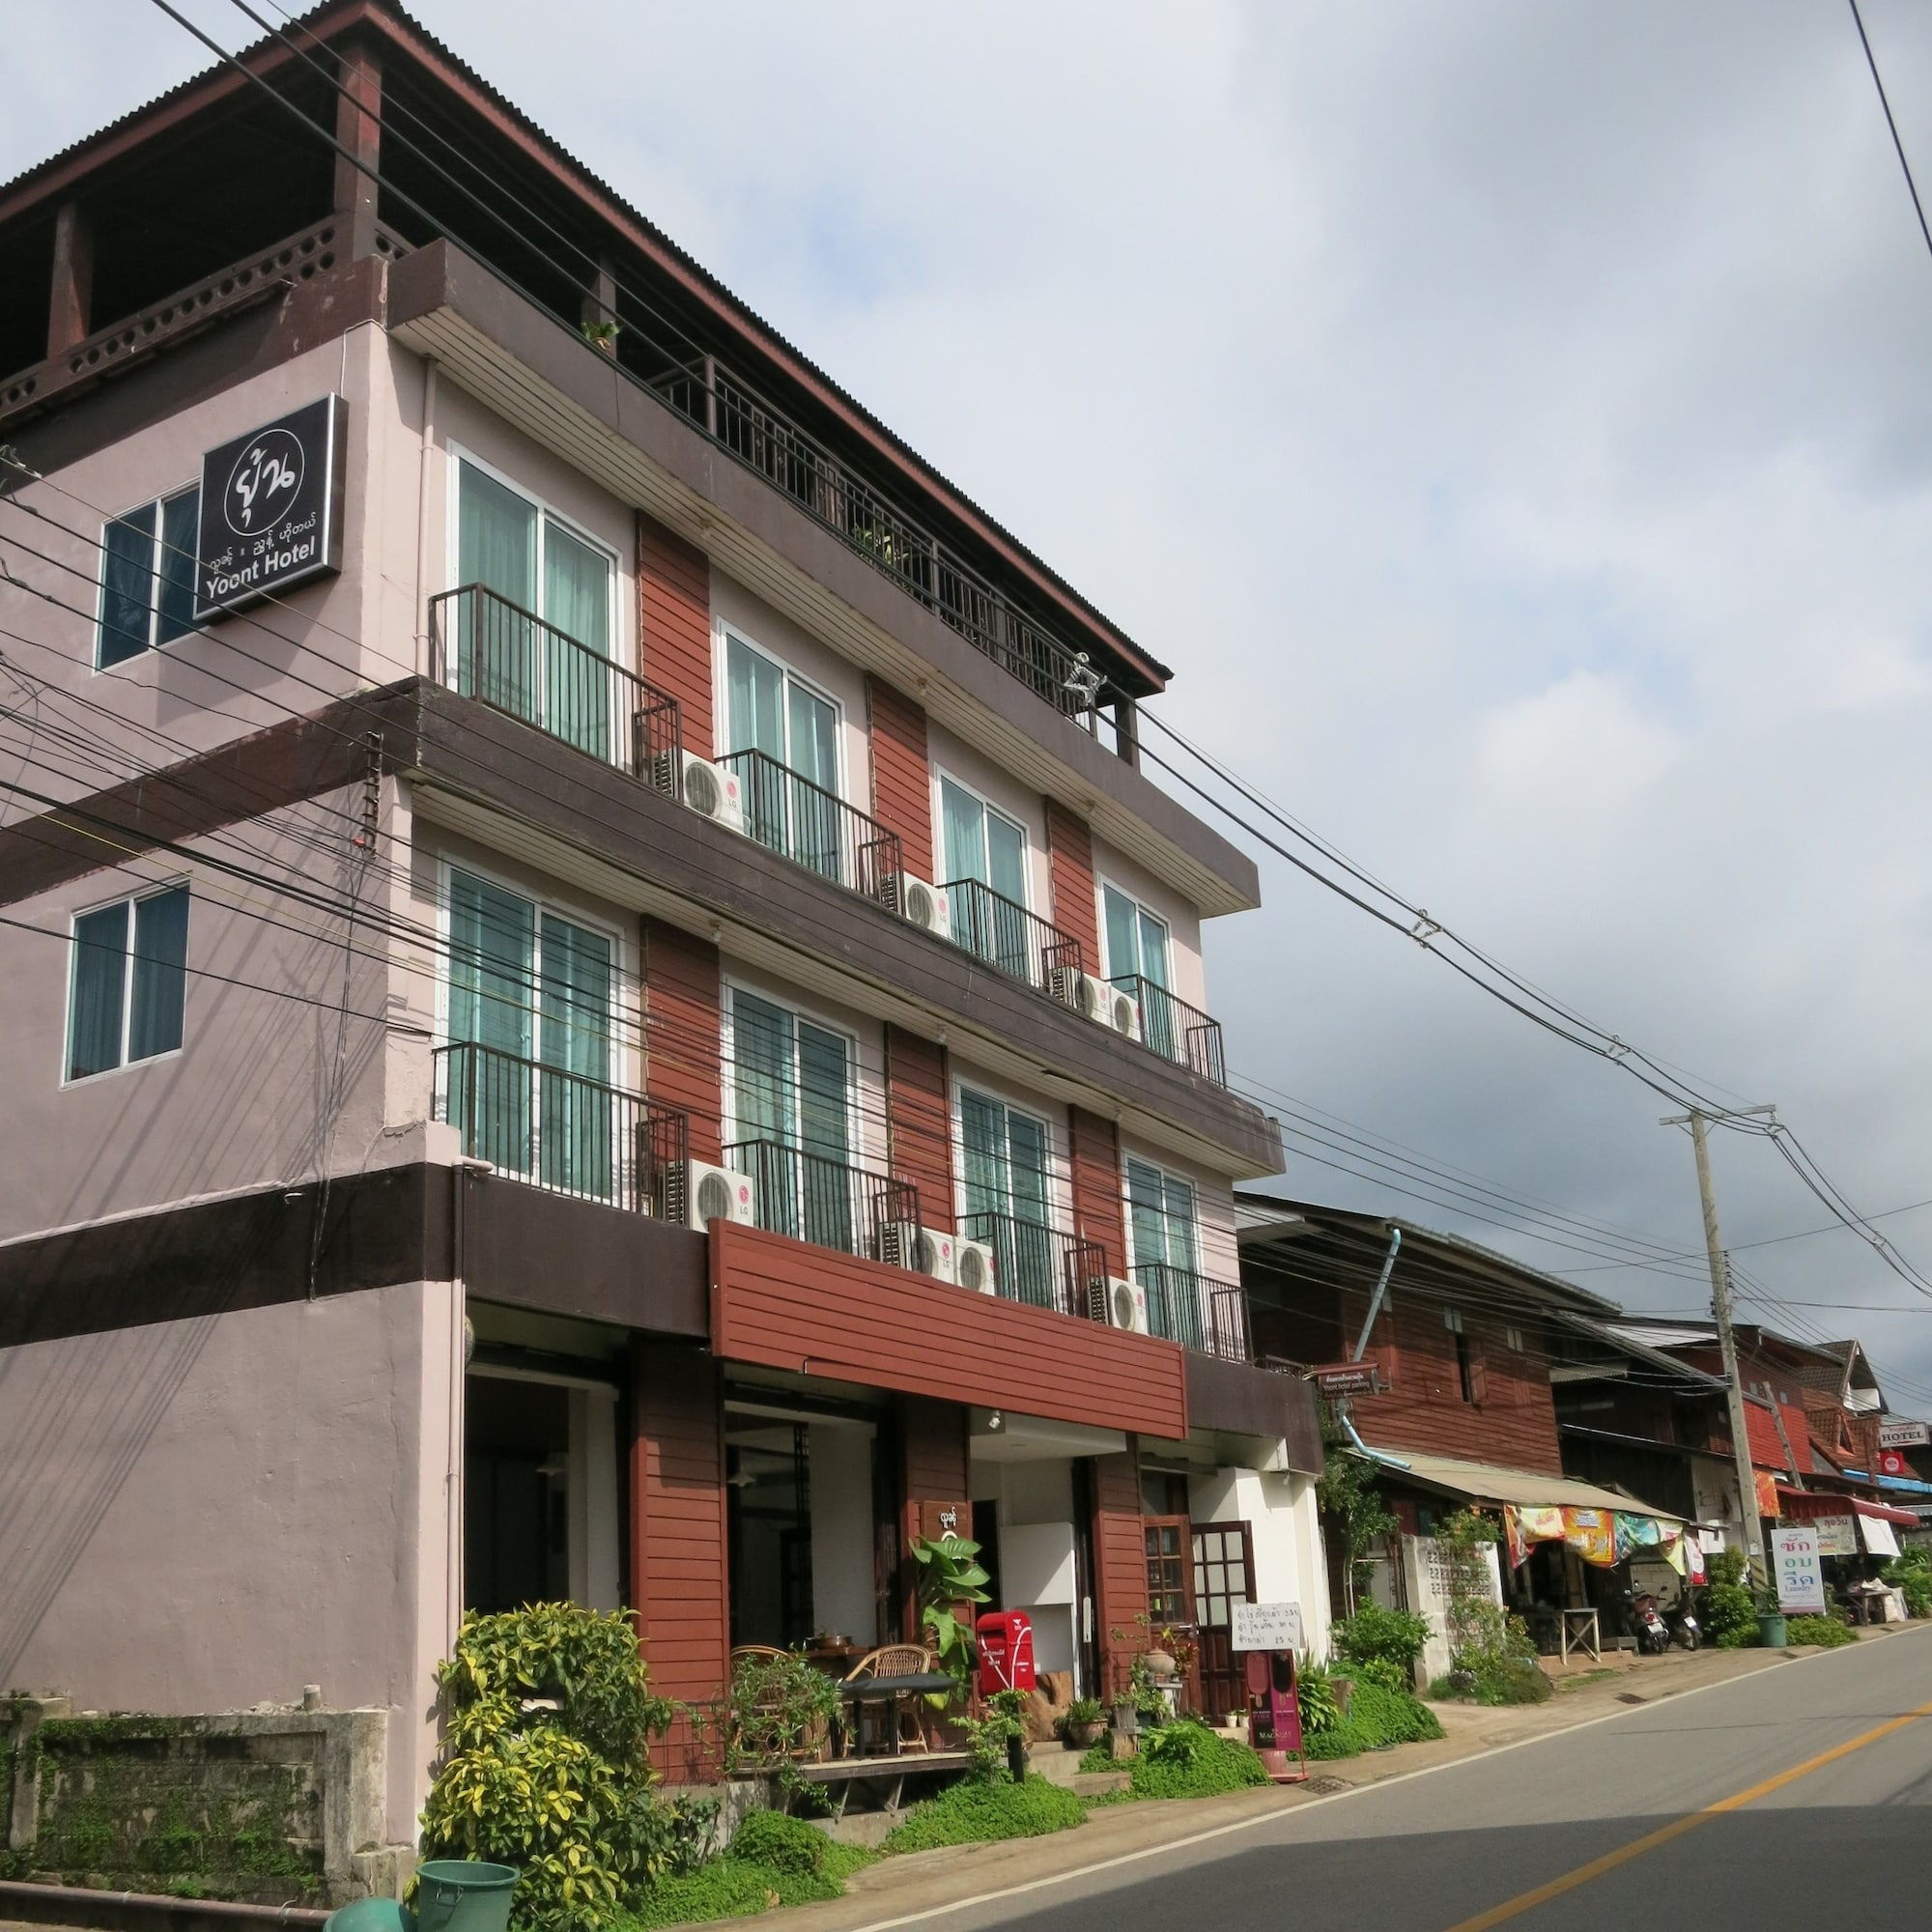 Yoont Hotel, Khun Yuam